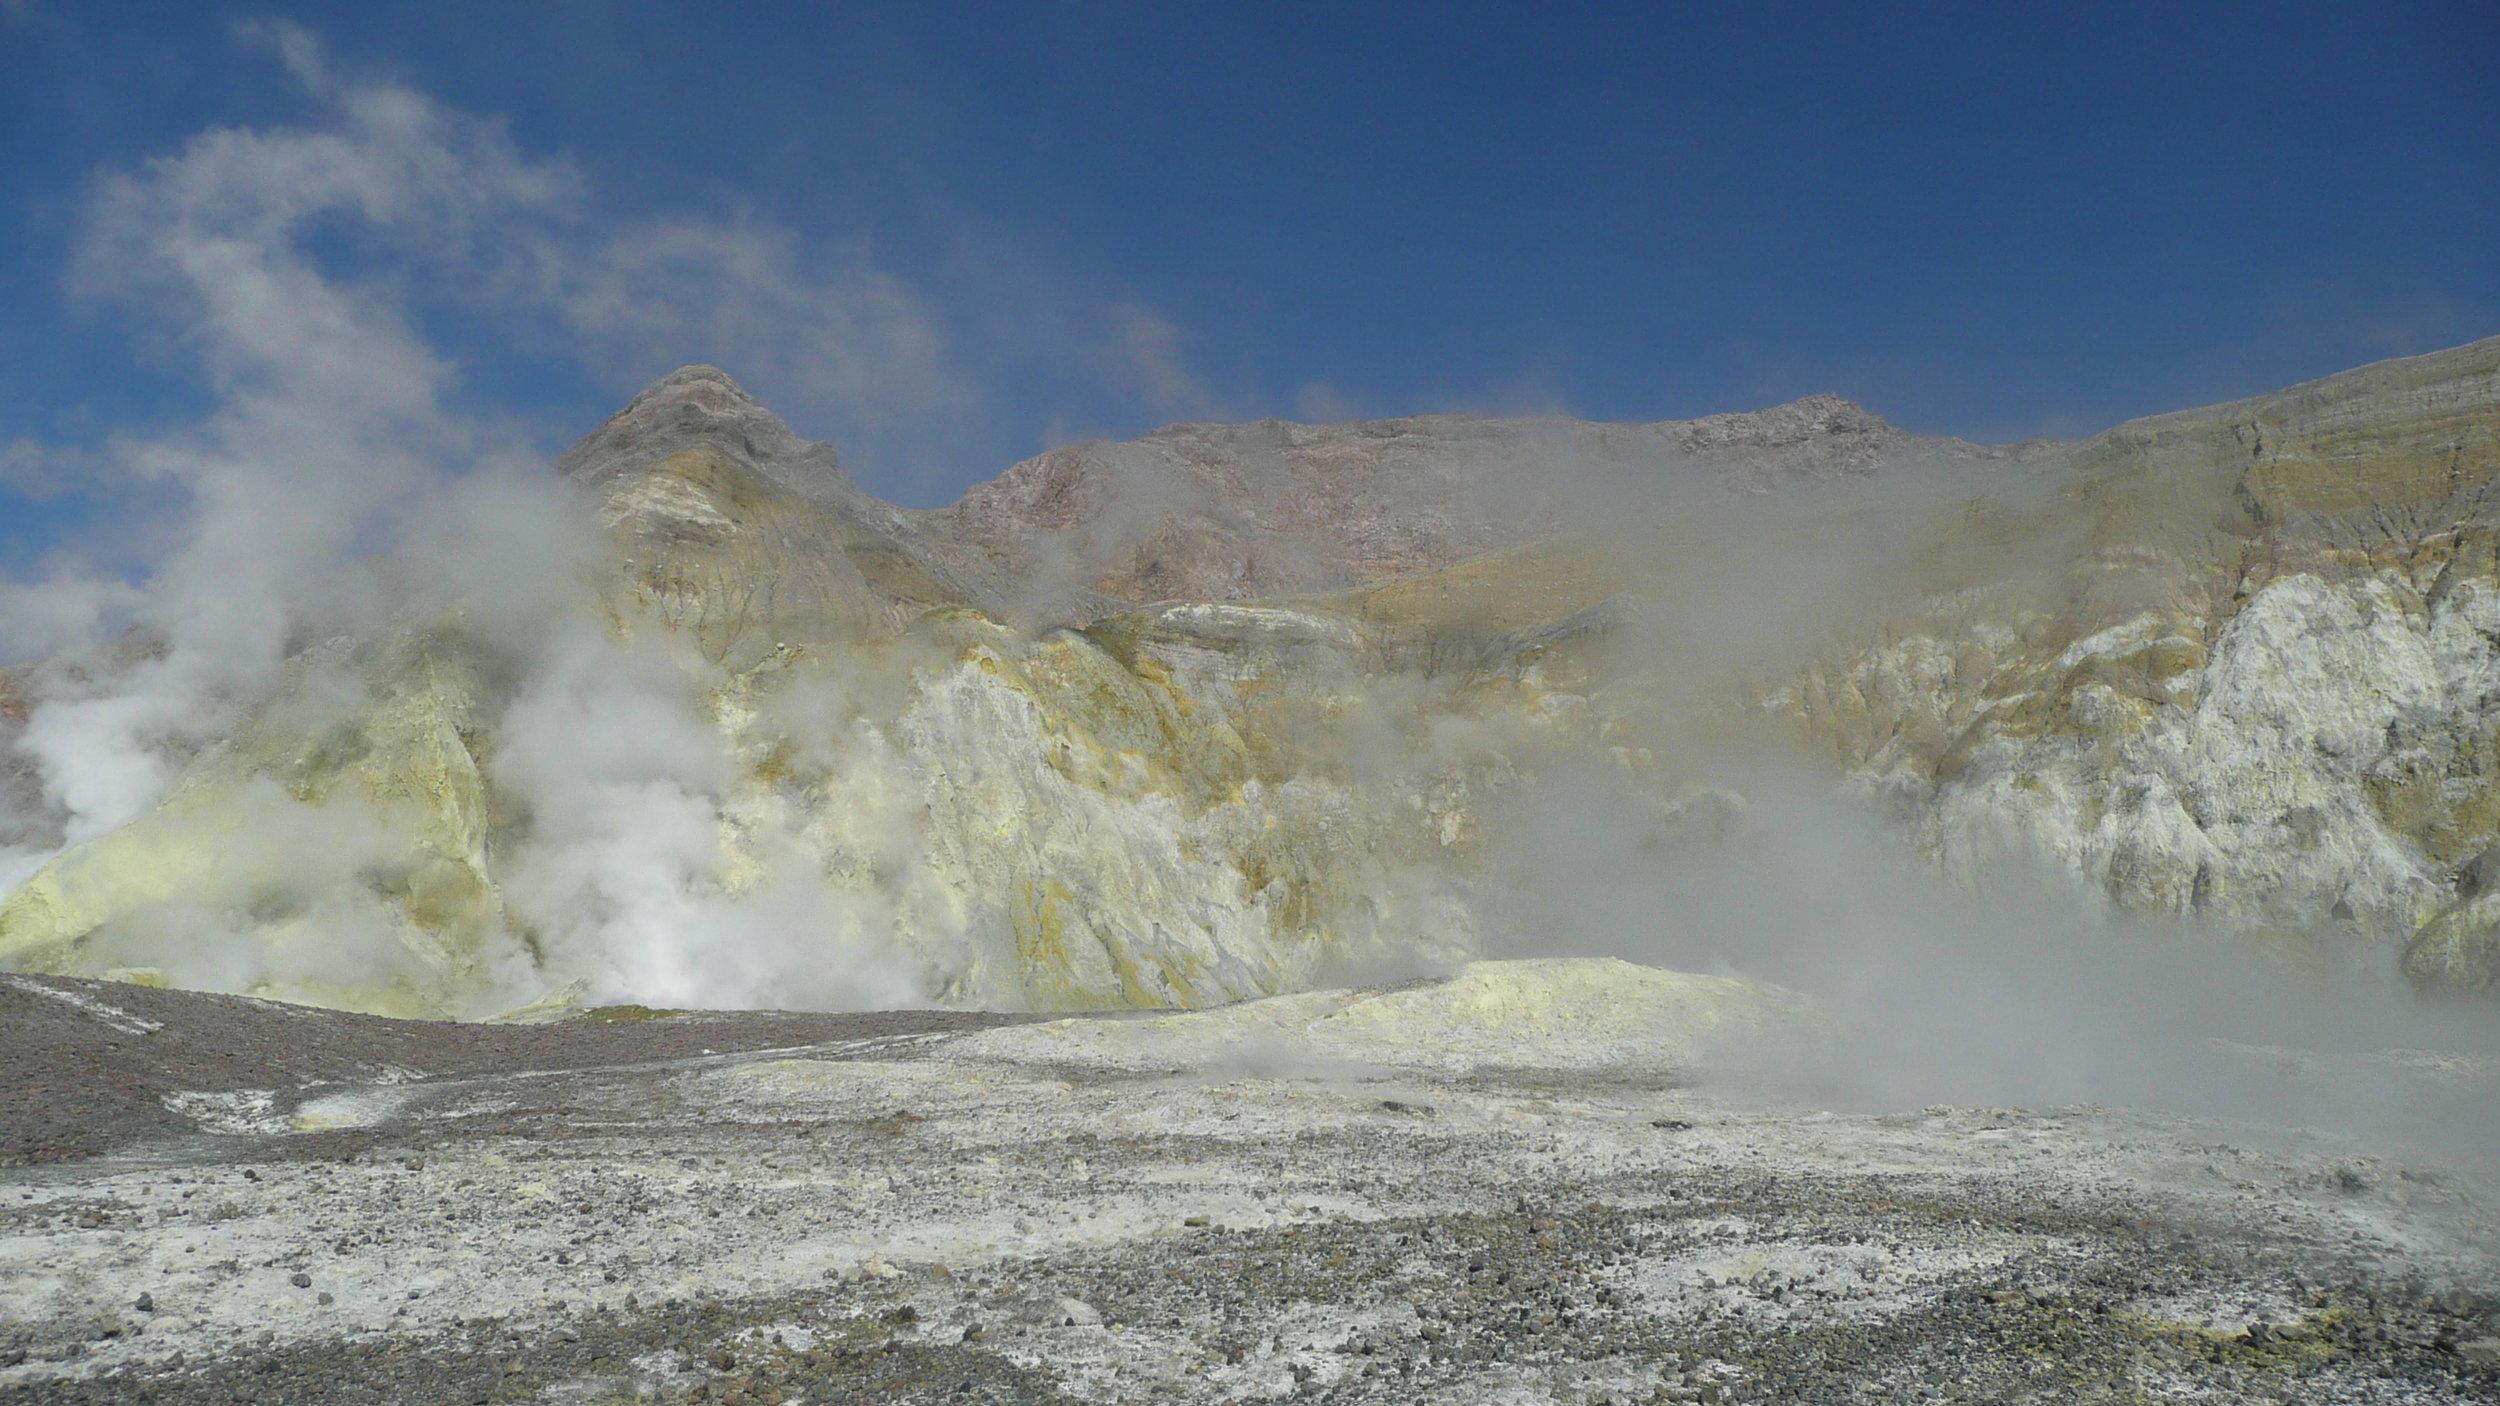 Inside the active marine volcano White island